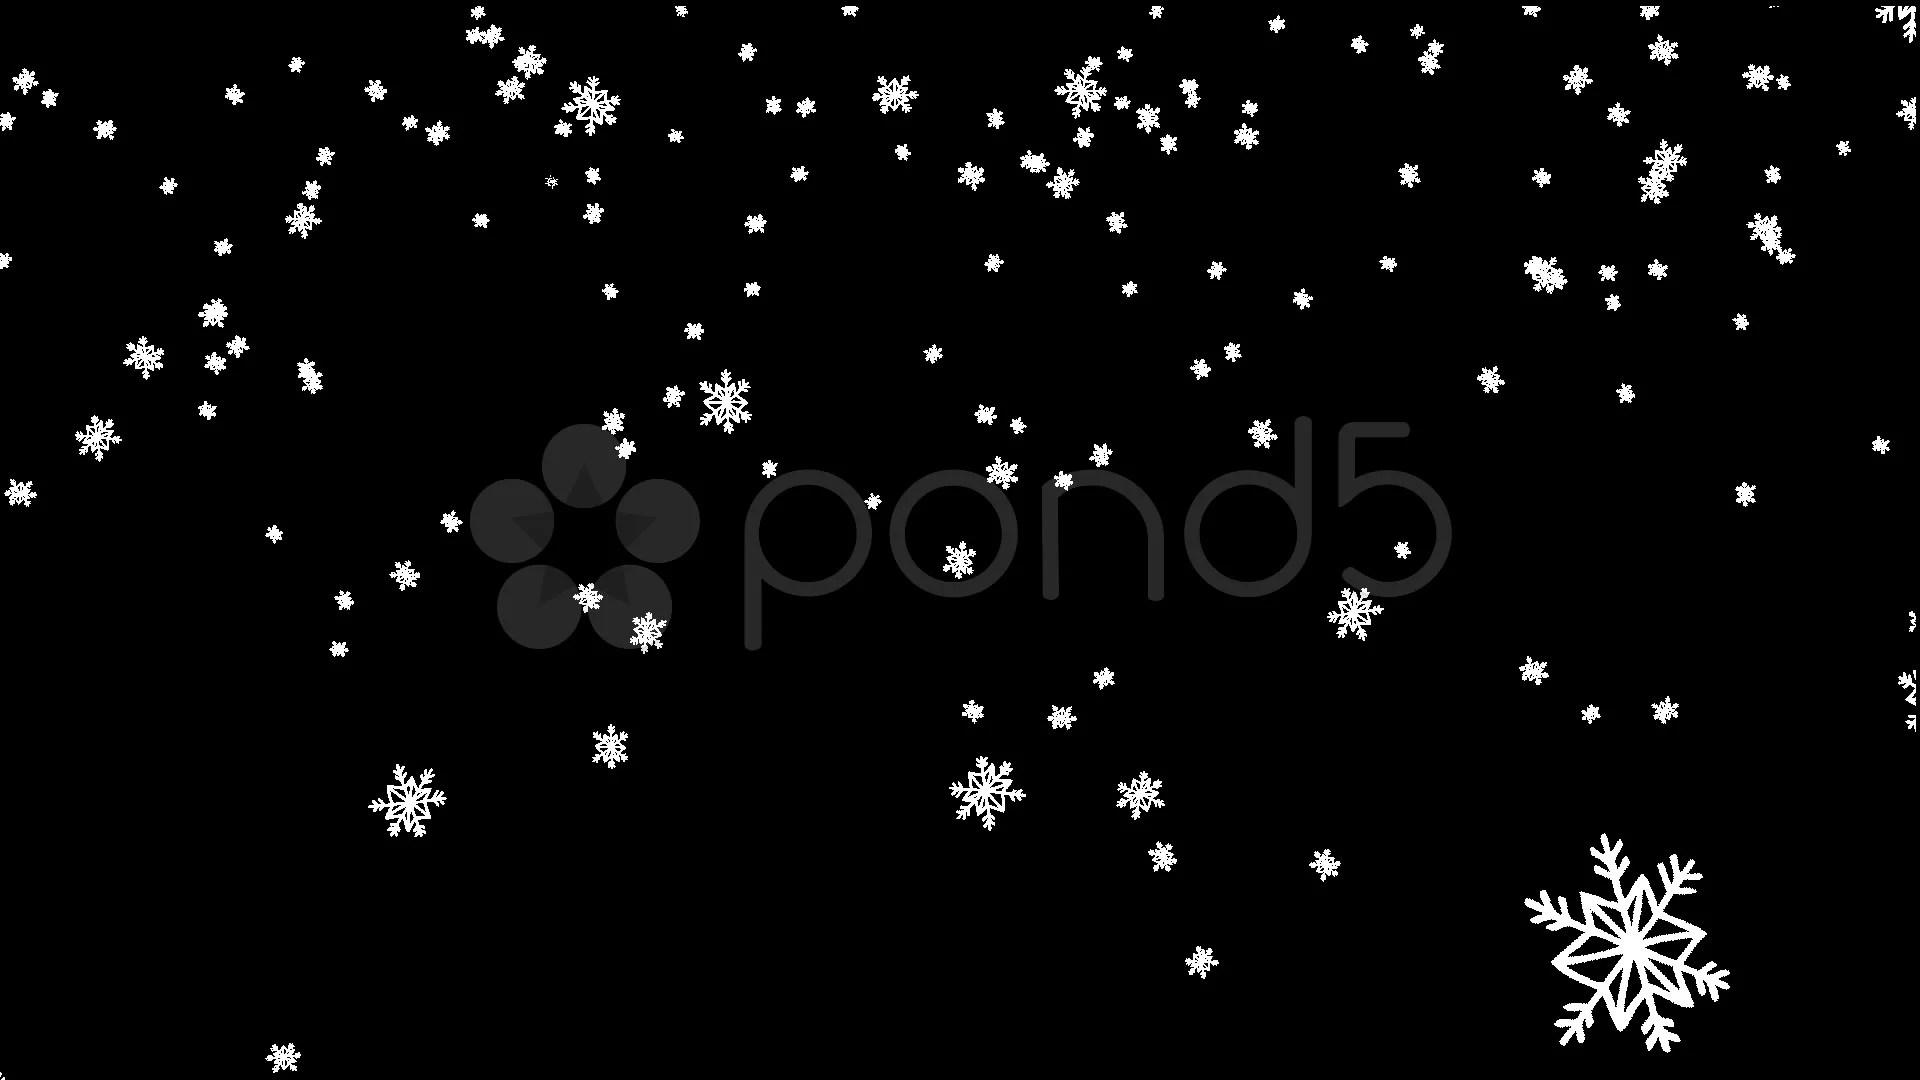 Snow Falling Wallpaper Download Cartoon Snowflakes Falling Big Stock Footage 12555468